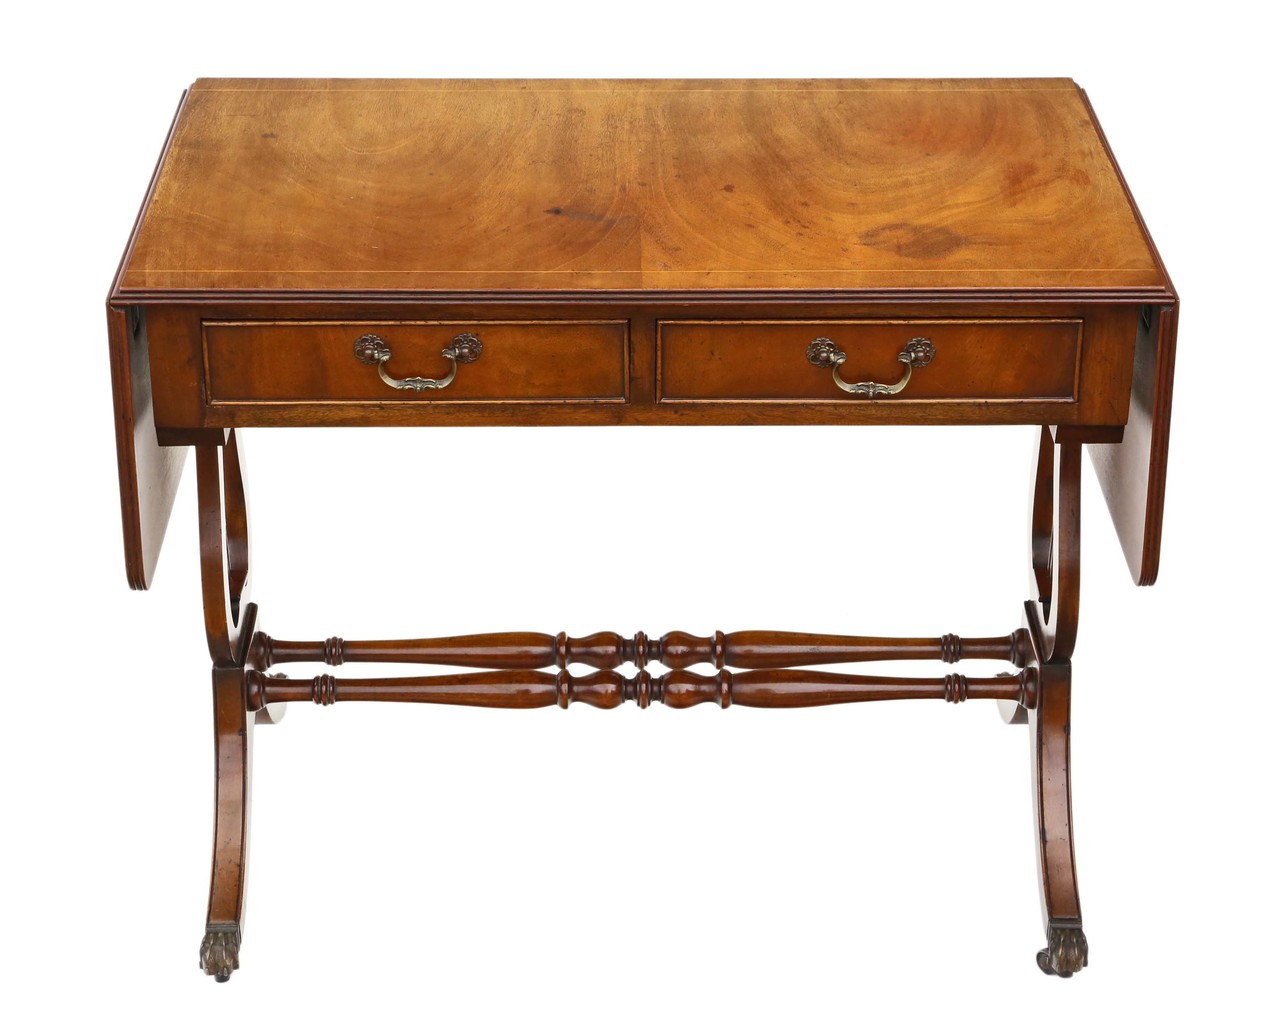 Astonishing Antique Georgian Regency Reproduction Mahogany Sofa Table Andrewgaddart Wooden Chair Designs For Living Room Andrewgaddartcom